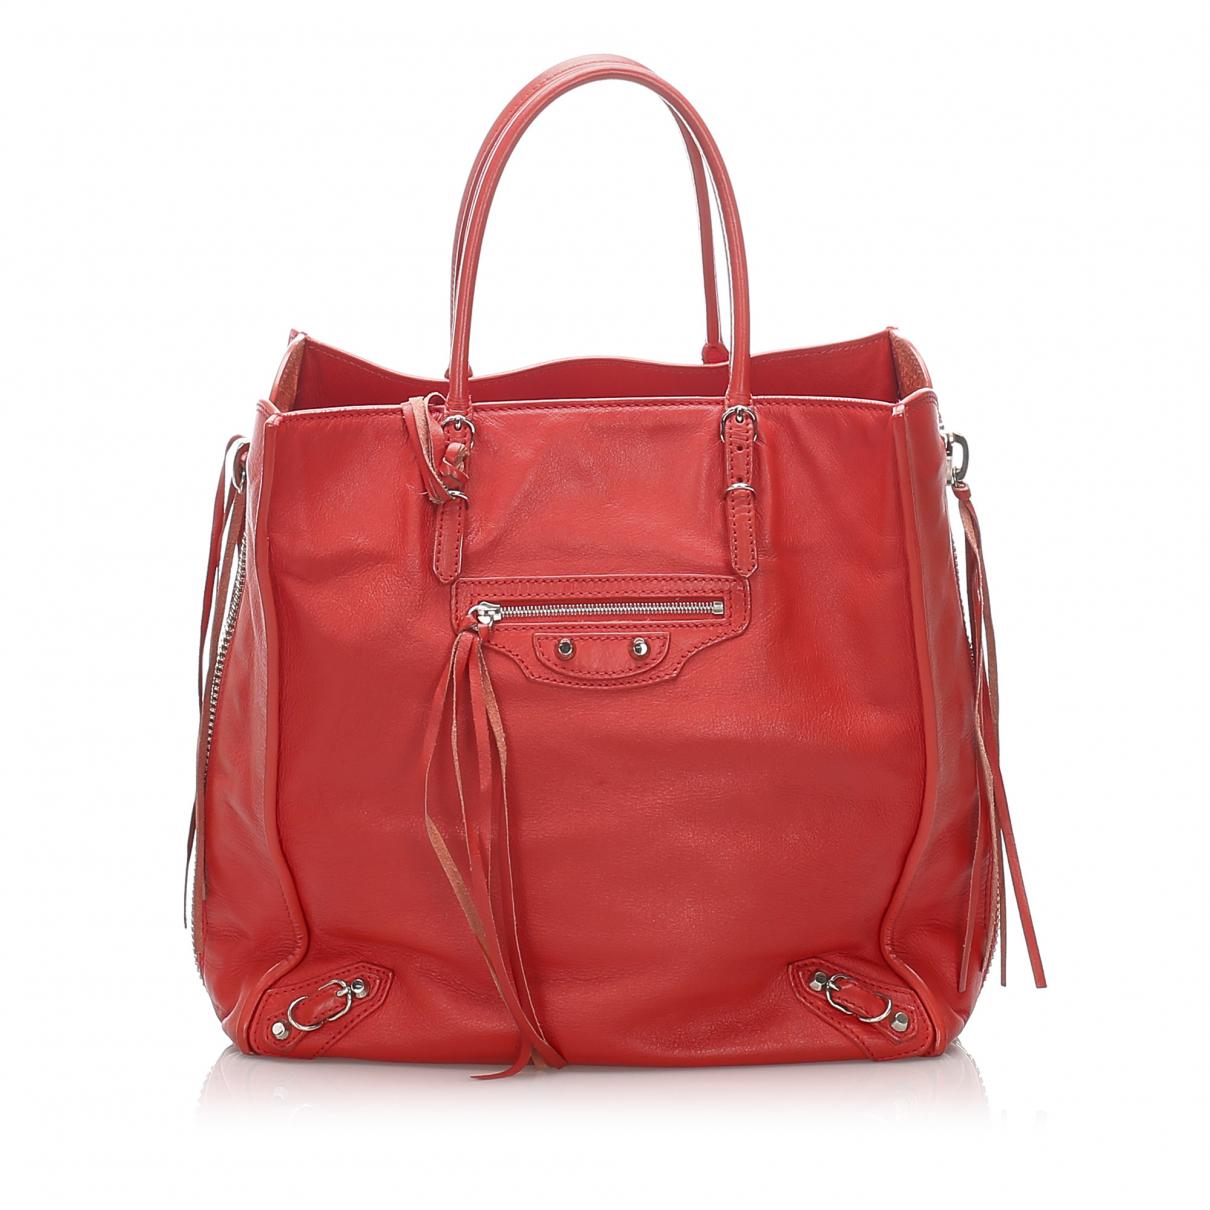 Balenciaga Papier Red Leather handbag for Women N